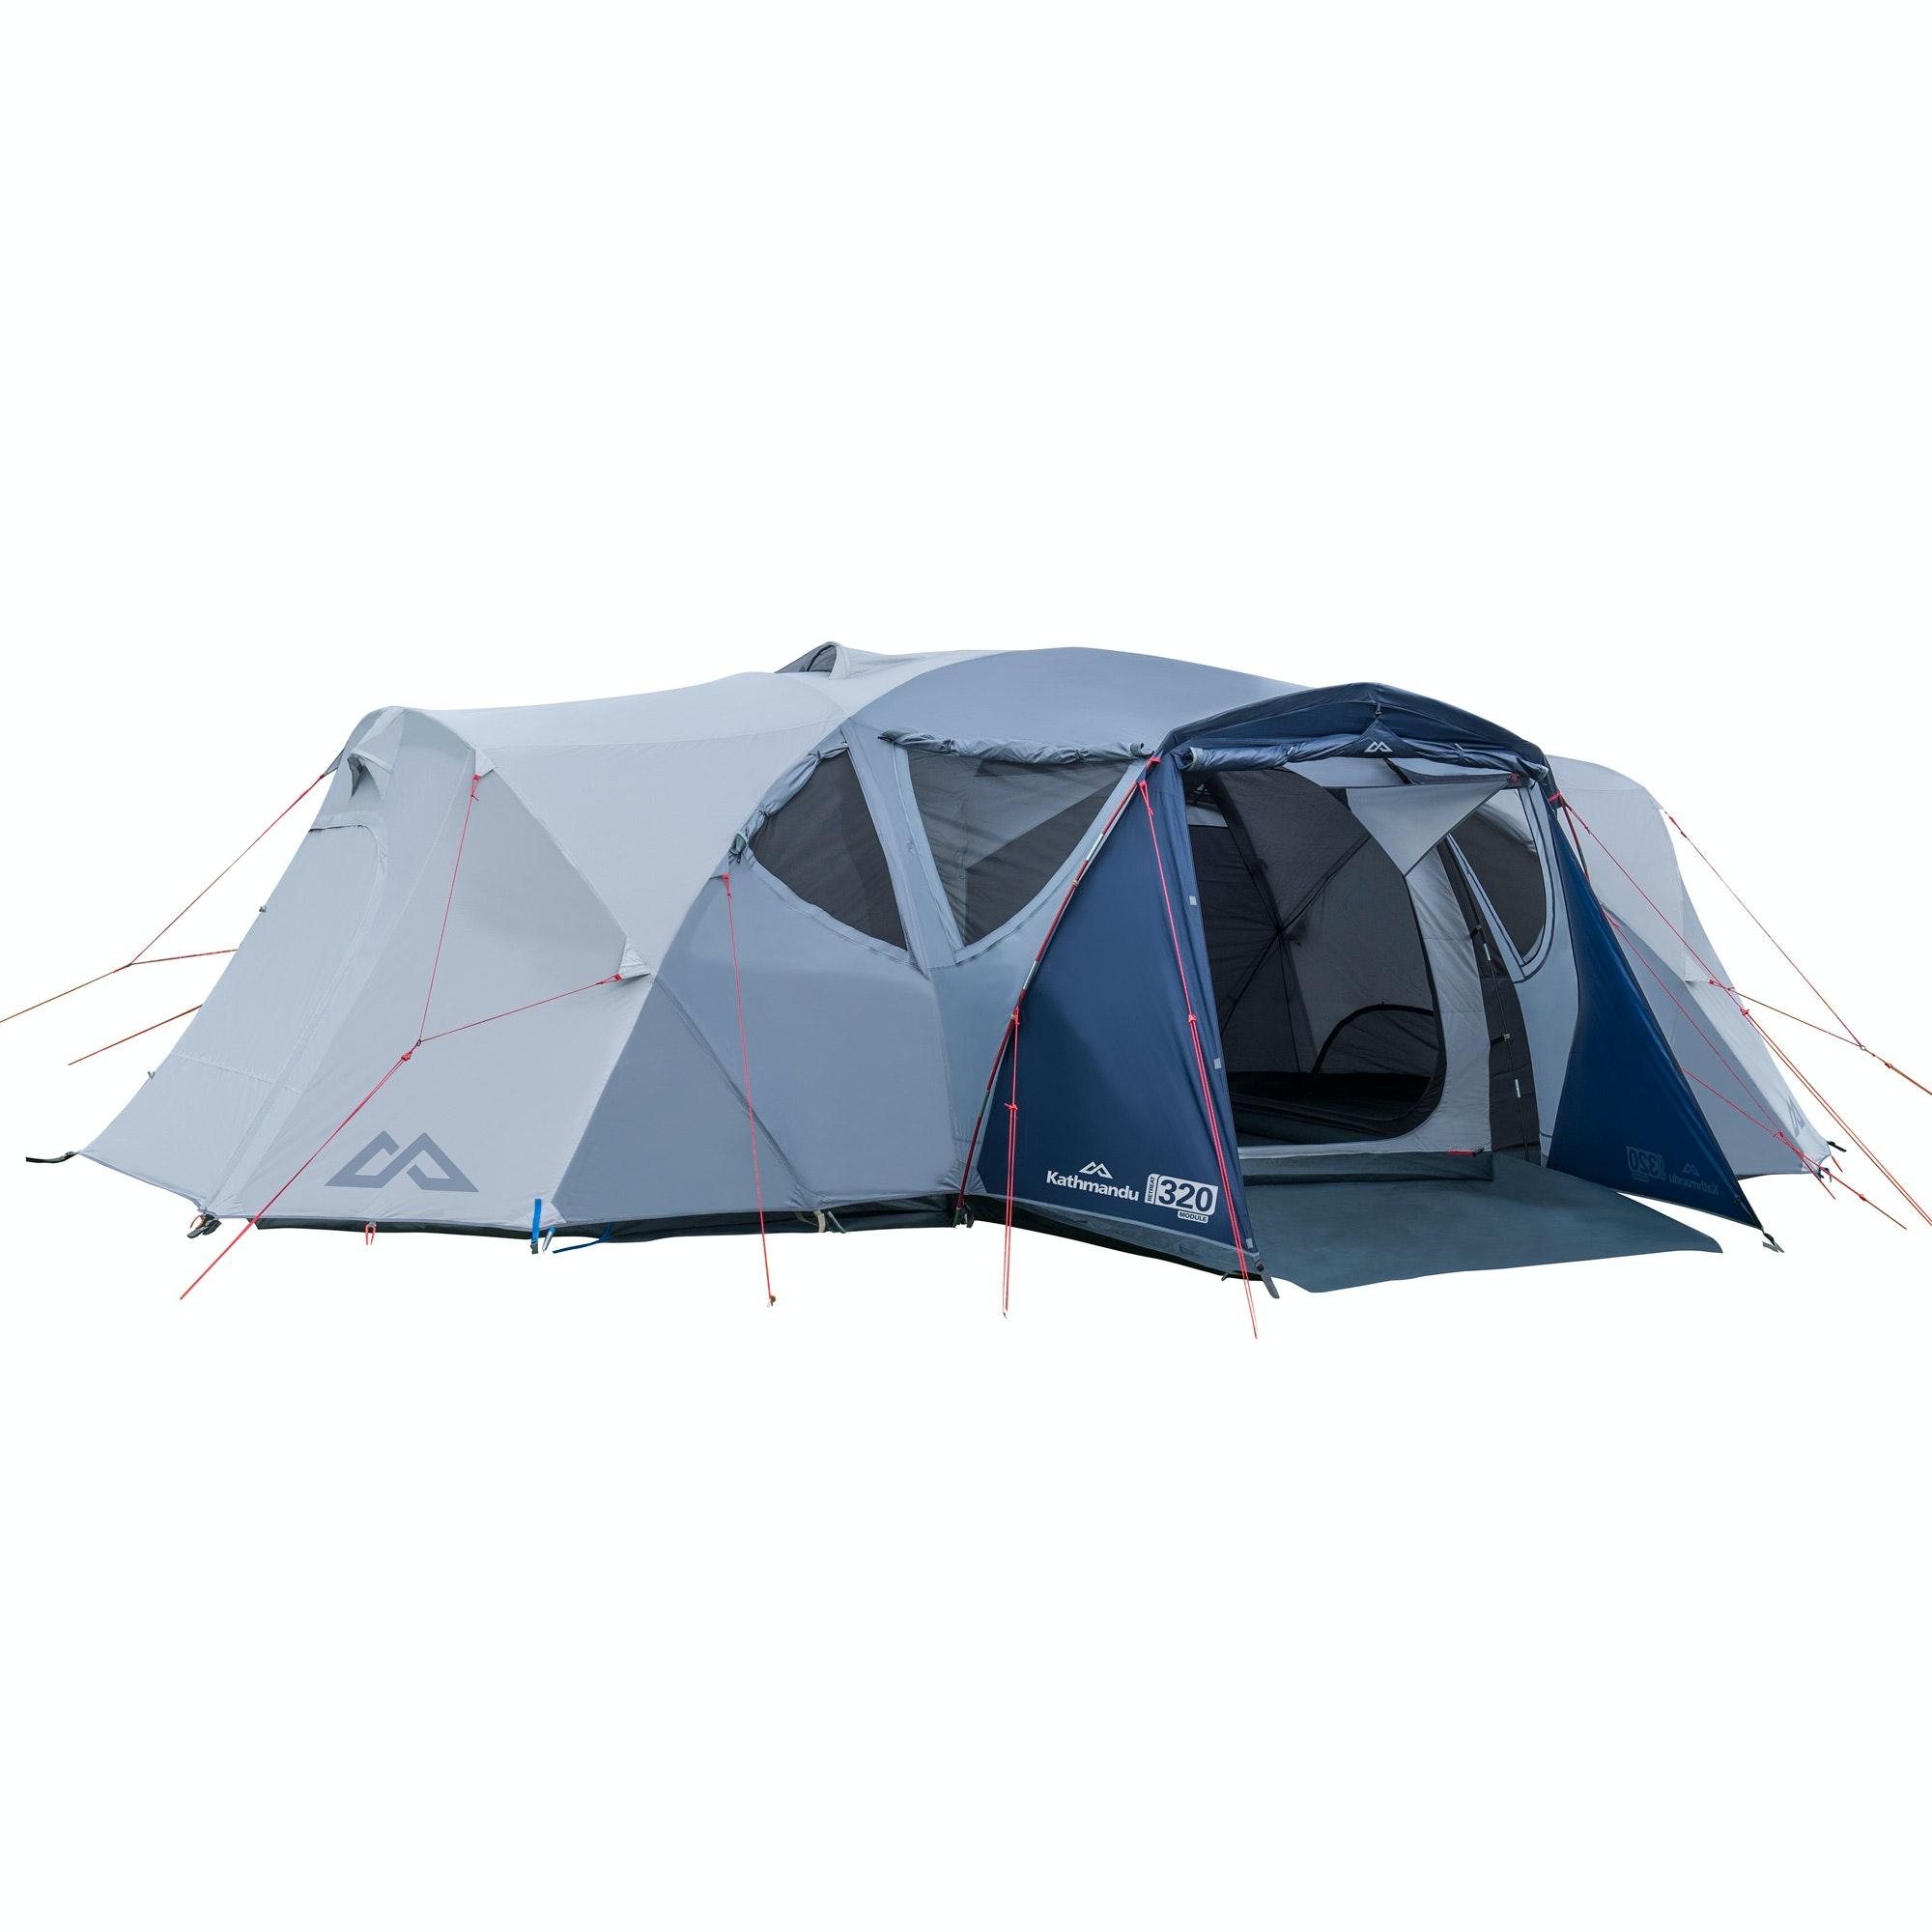 H42  sc 1 st  Kathmandu & Retreat 320 6 Person Module Tent - Dark Navy/Cloud